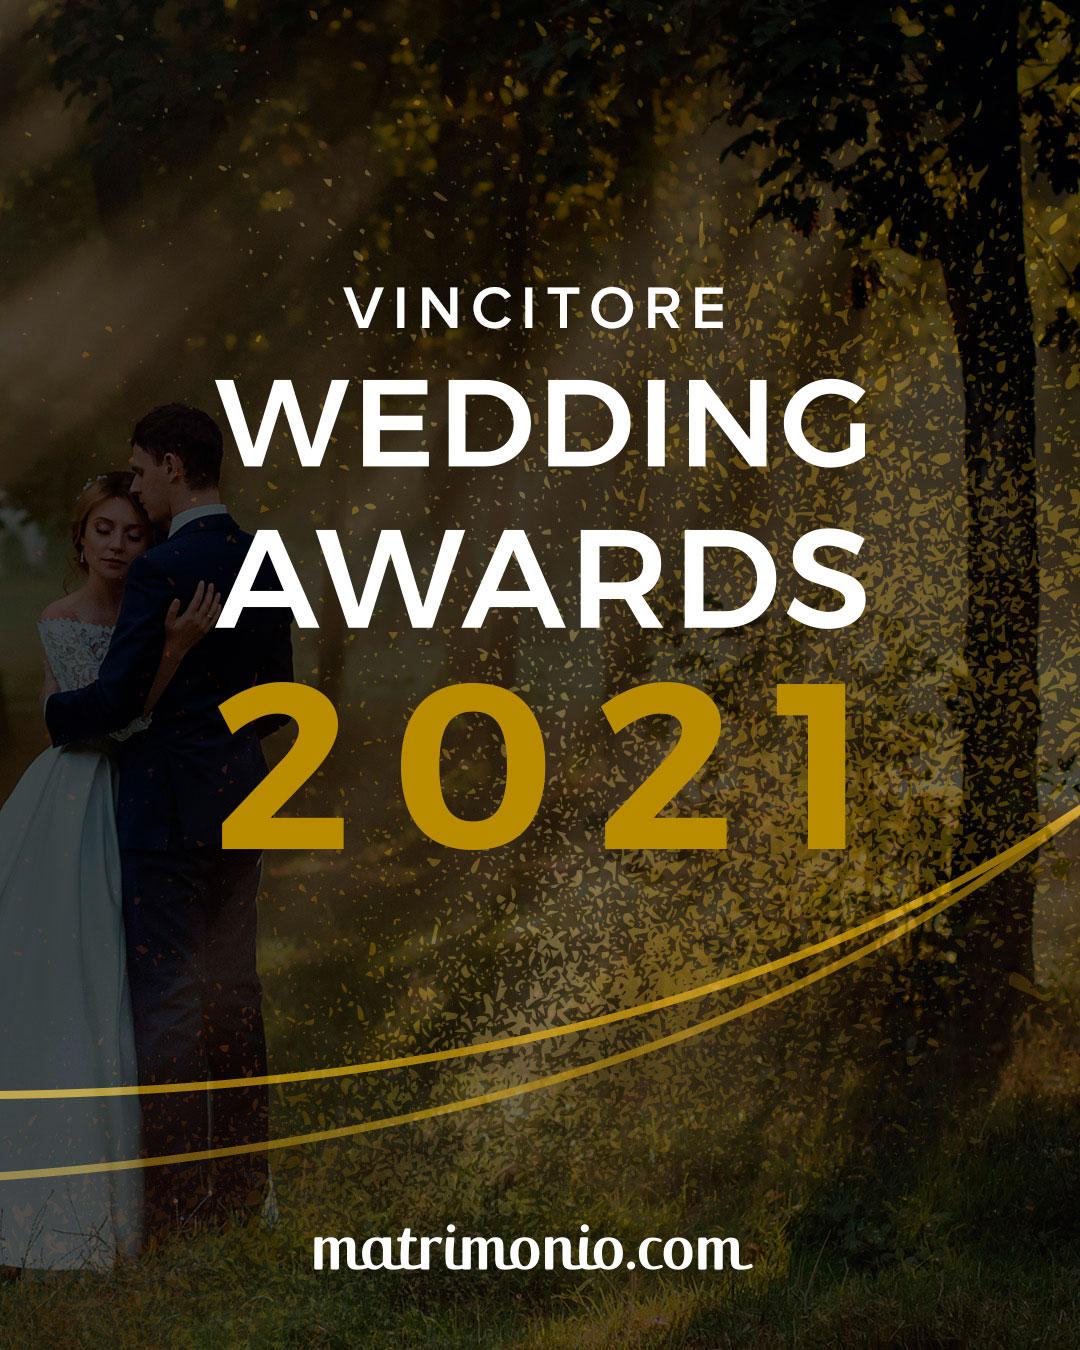 weddingawards2021